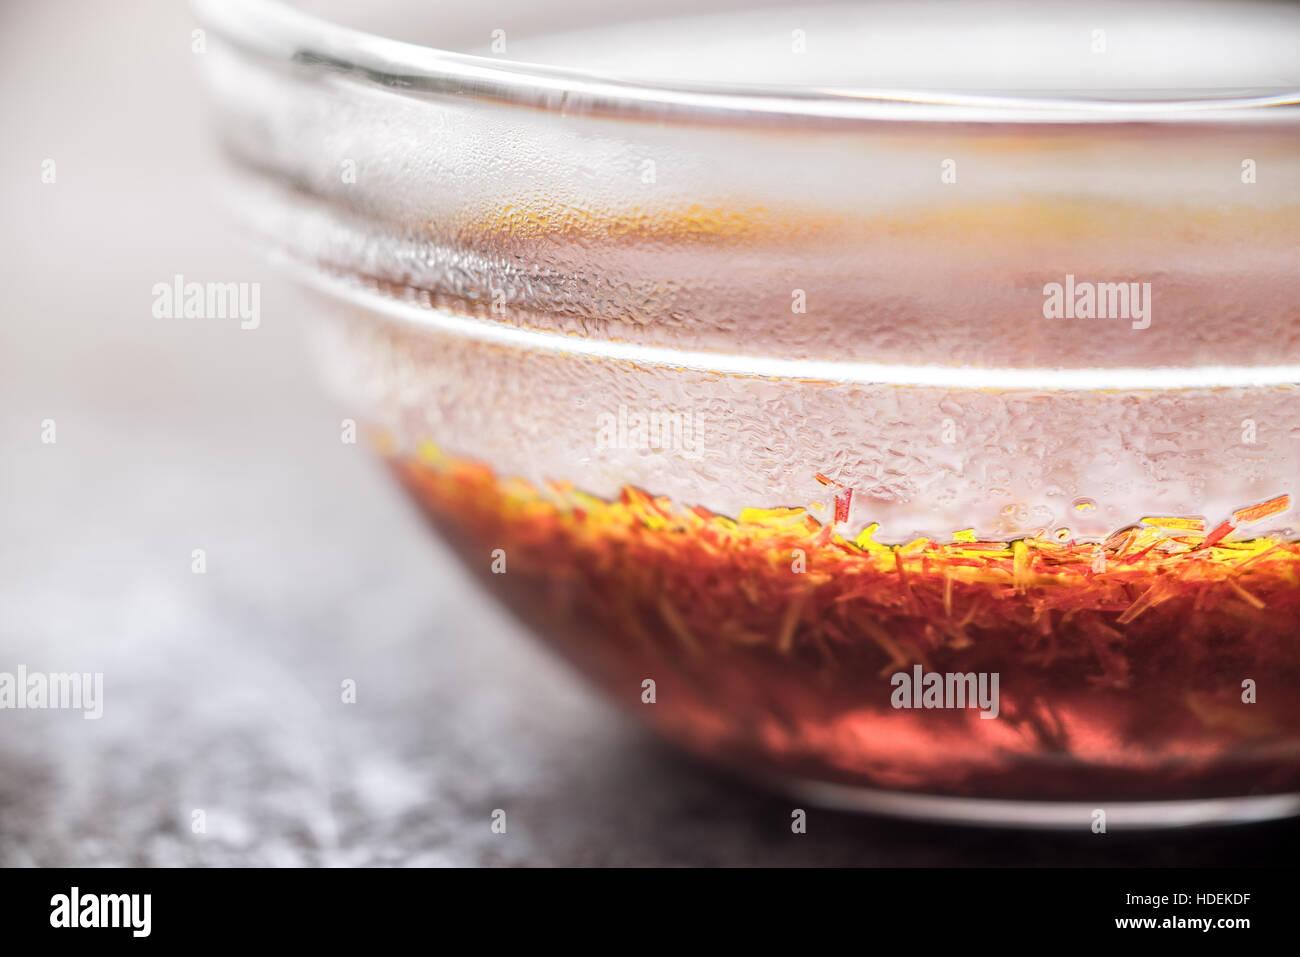 Safran in Glas Schüssel horizontal Stockbild